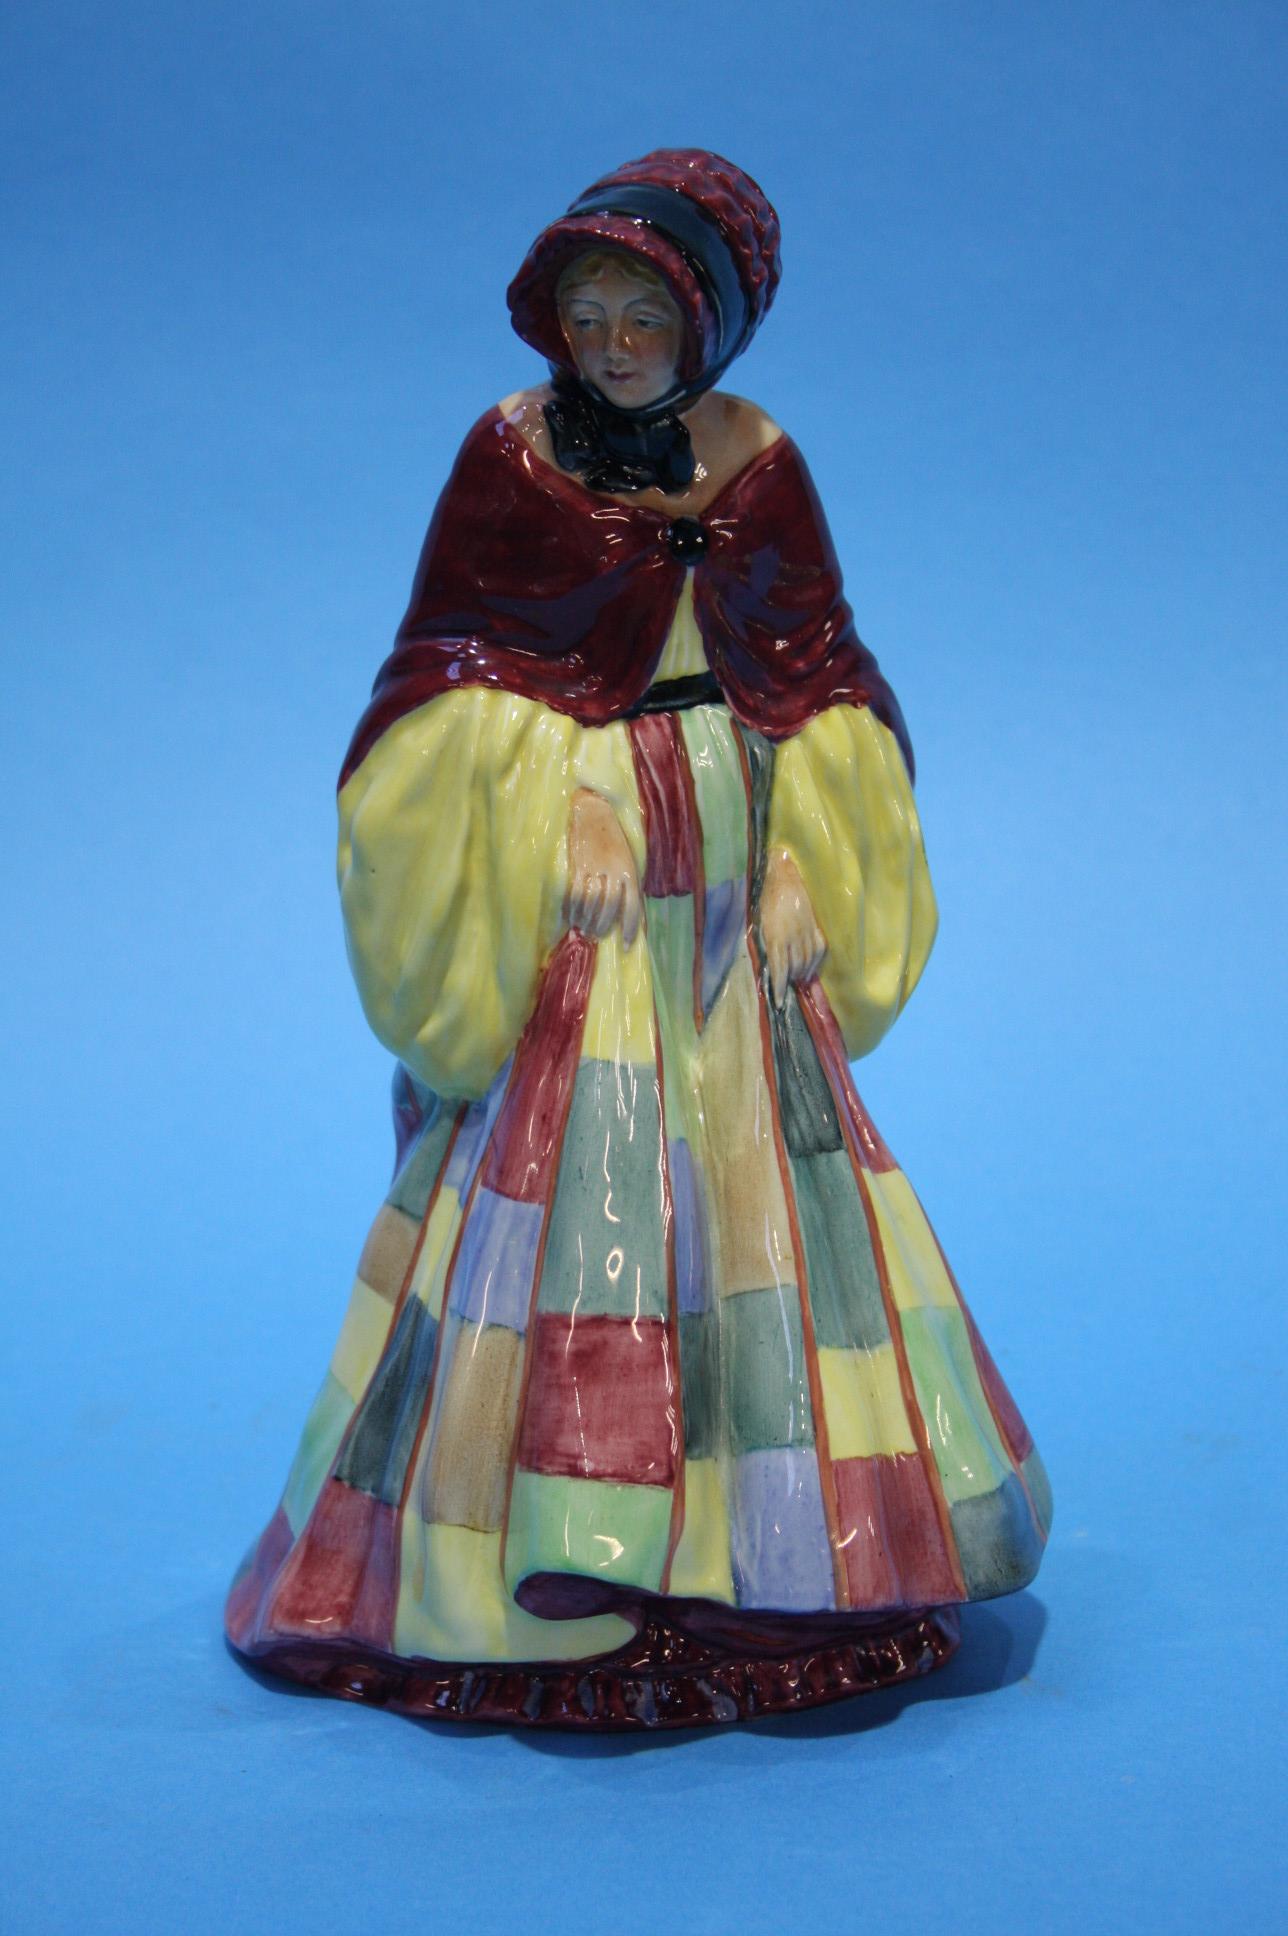 Lot 60 - A Royal Doulton figure 'The Parson's Daughter', HN